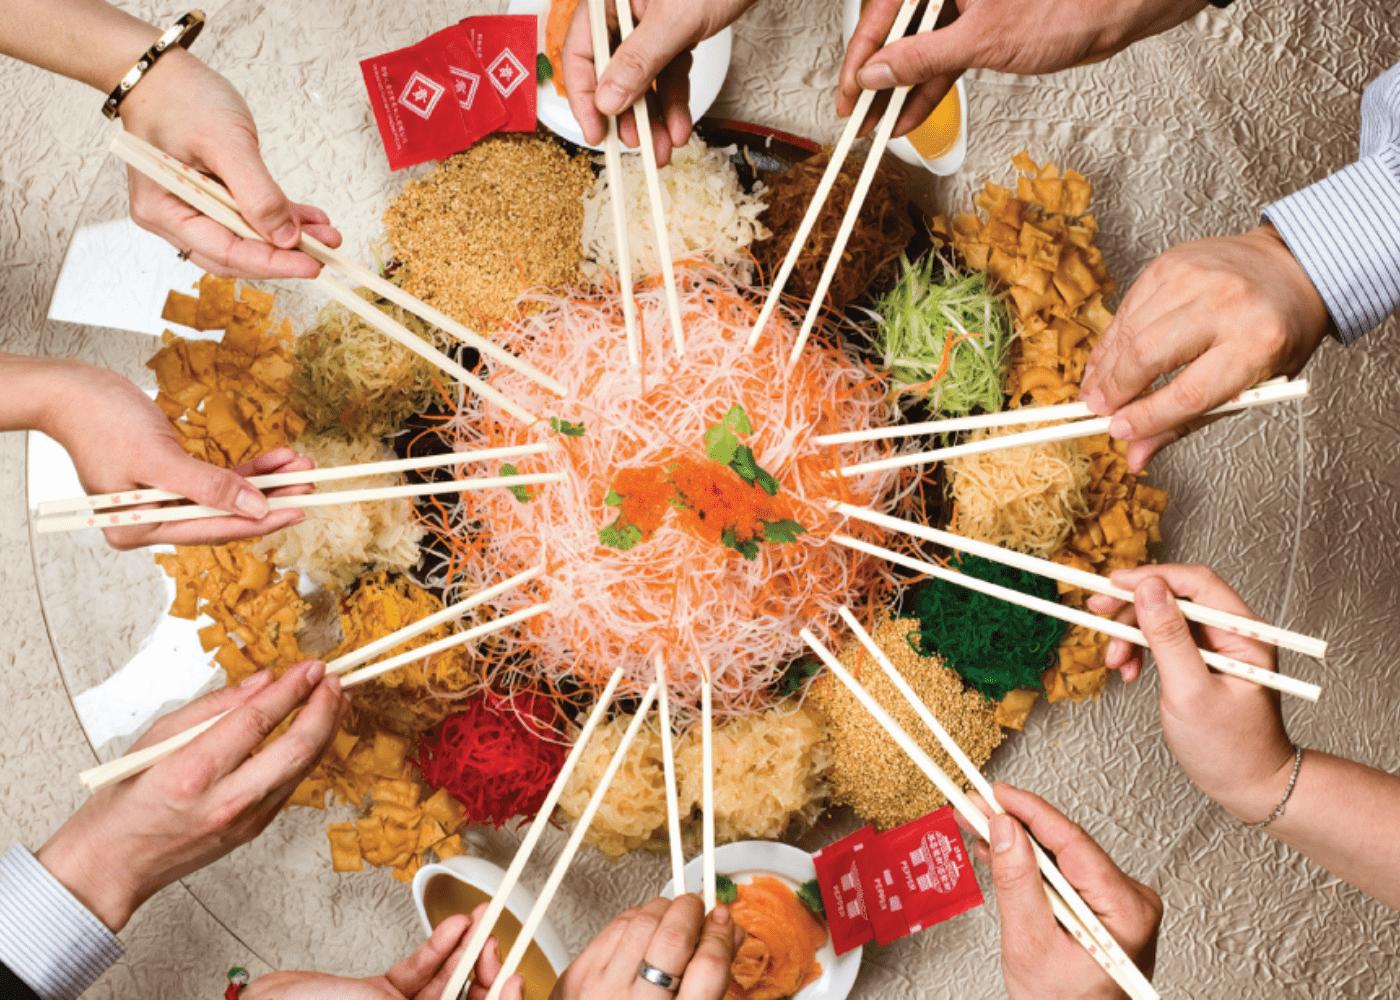 CNY-reunion-dinner-restaurants - xperience restaurants